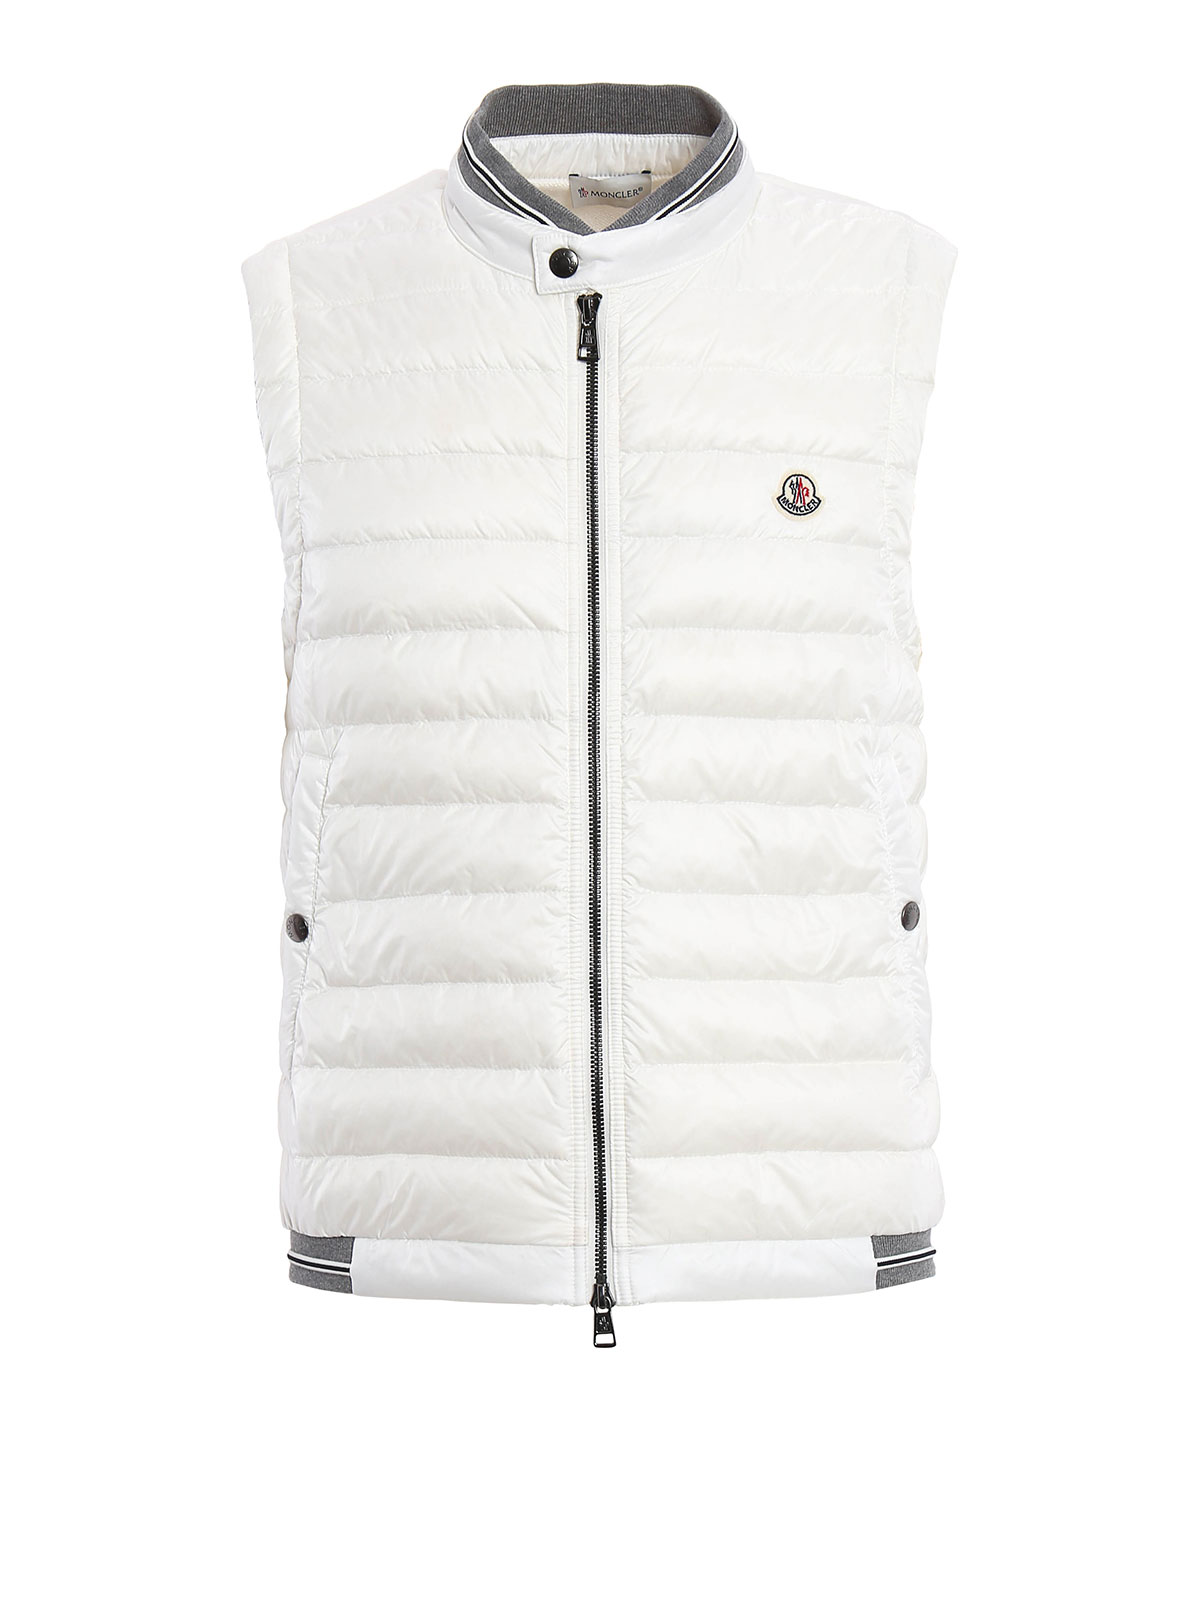 finest selection 2ded6 0a2d5 Moncler - Piumino smanicato - giacche imbottite - B1 091 ...